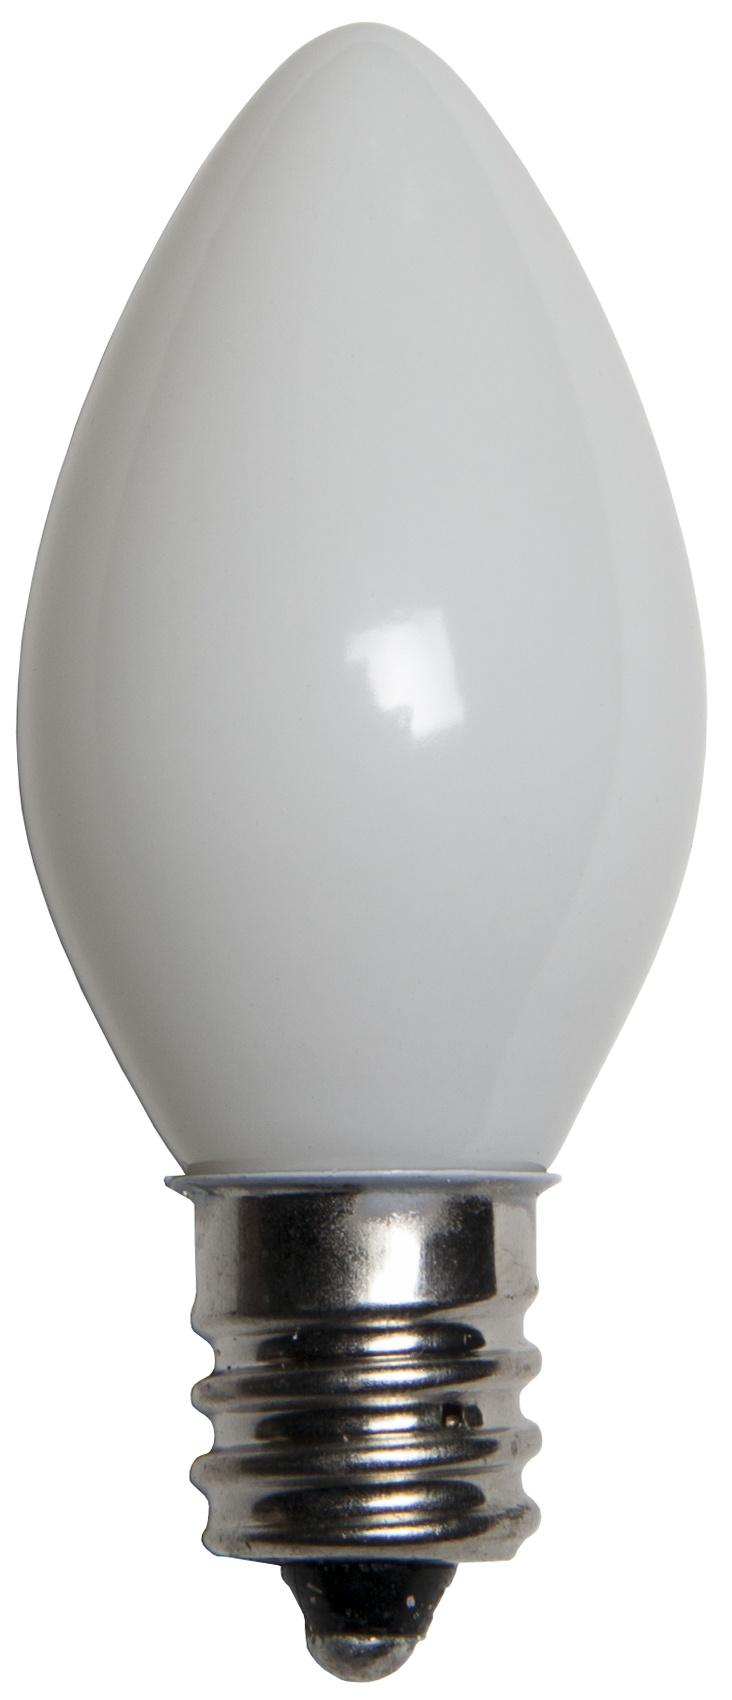 C7 Light Bulb, White Opaque - Yard Envy